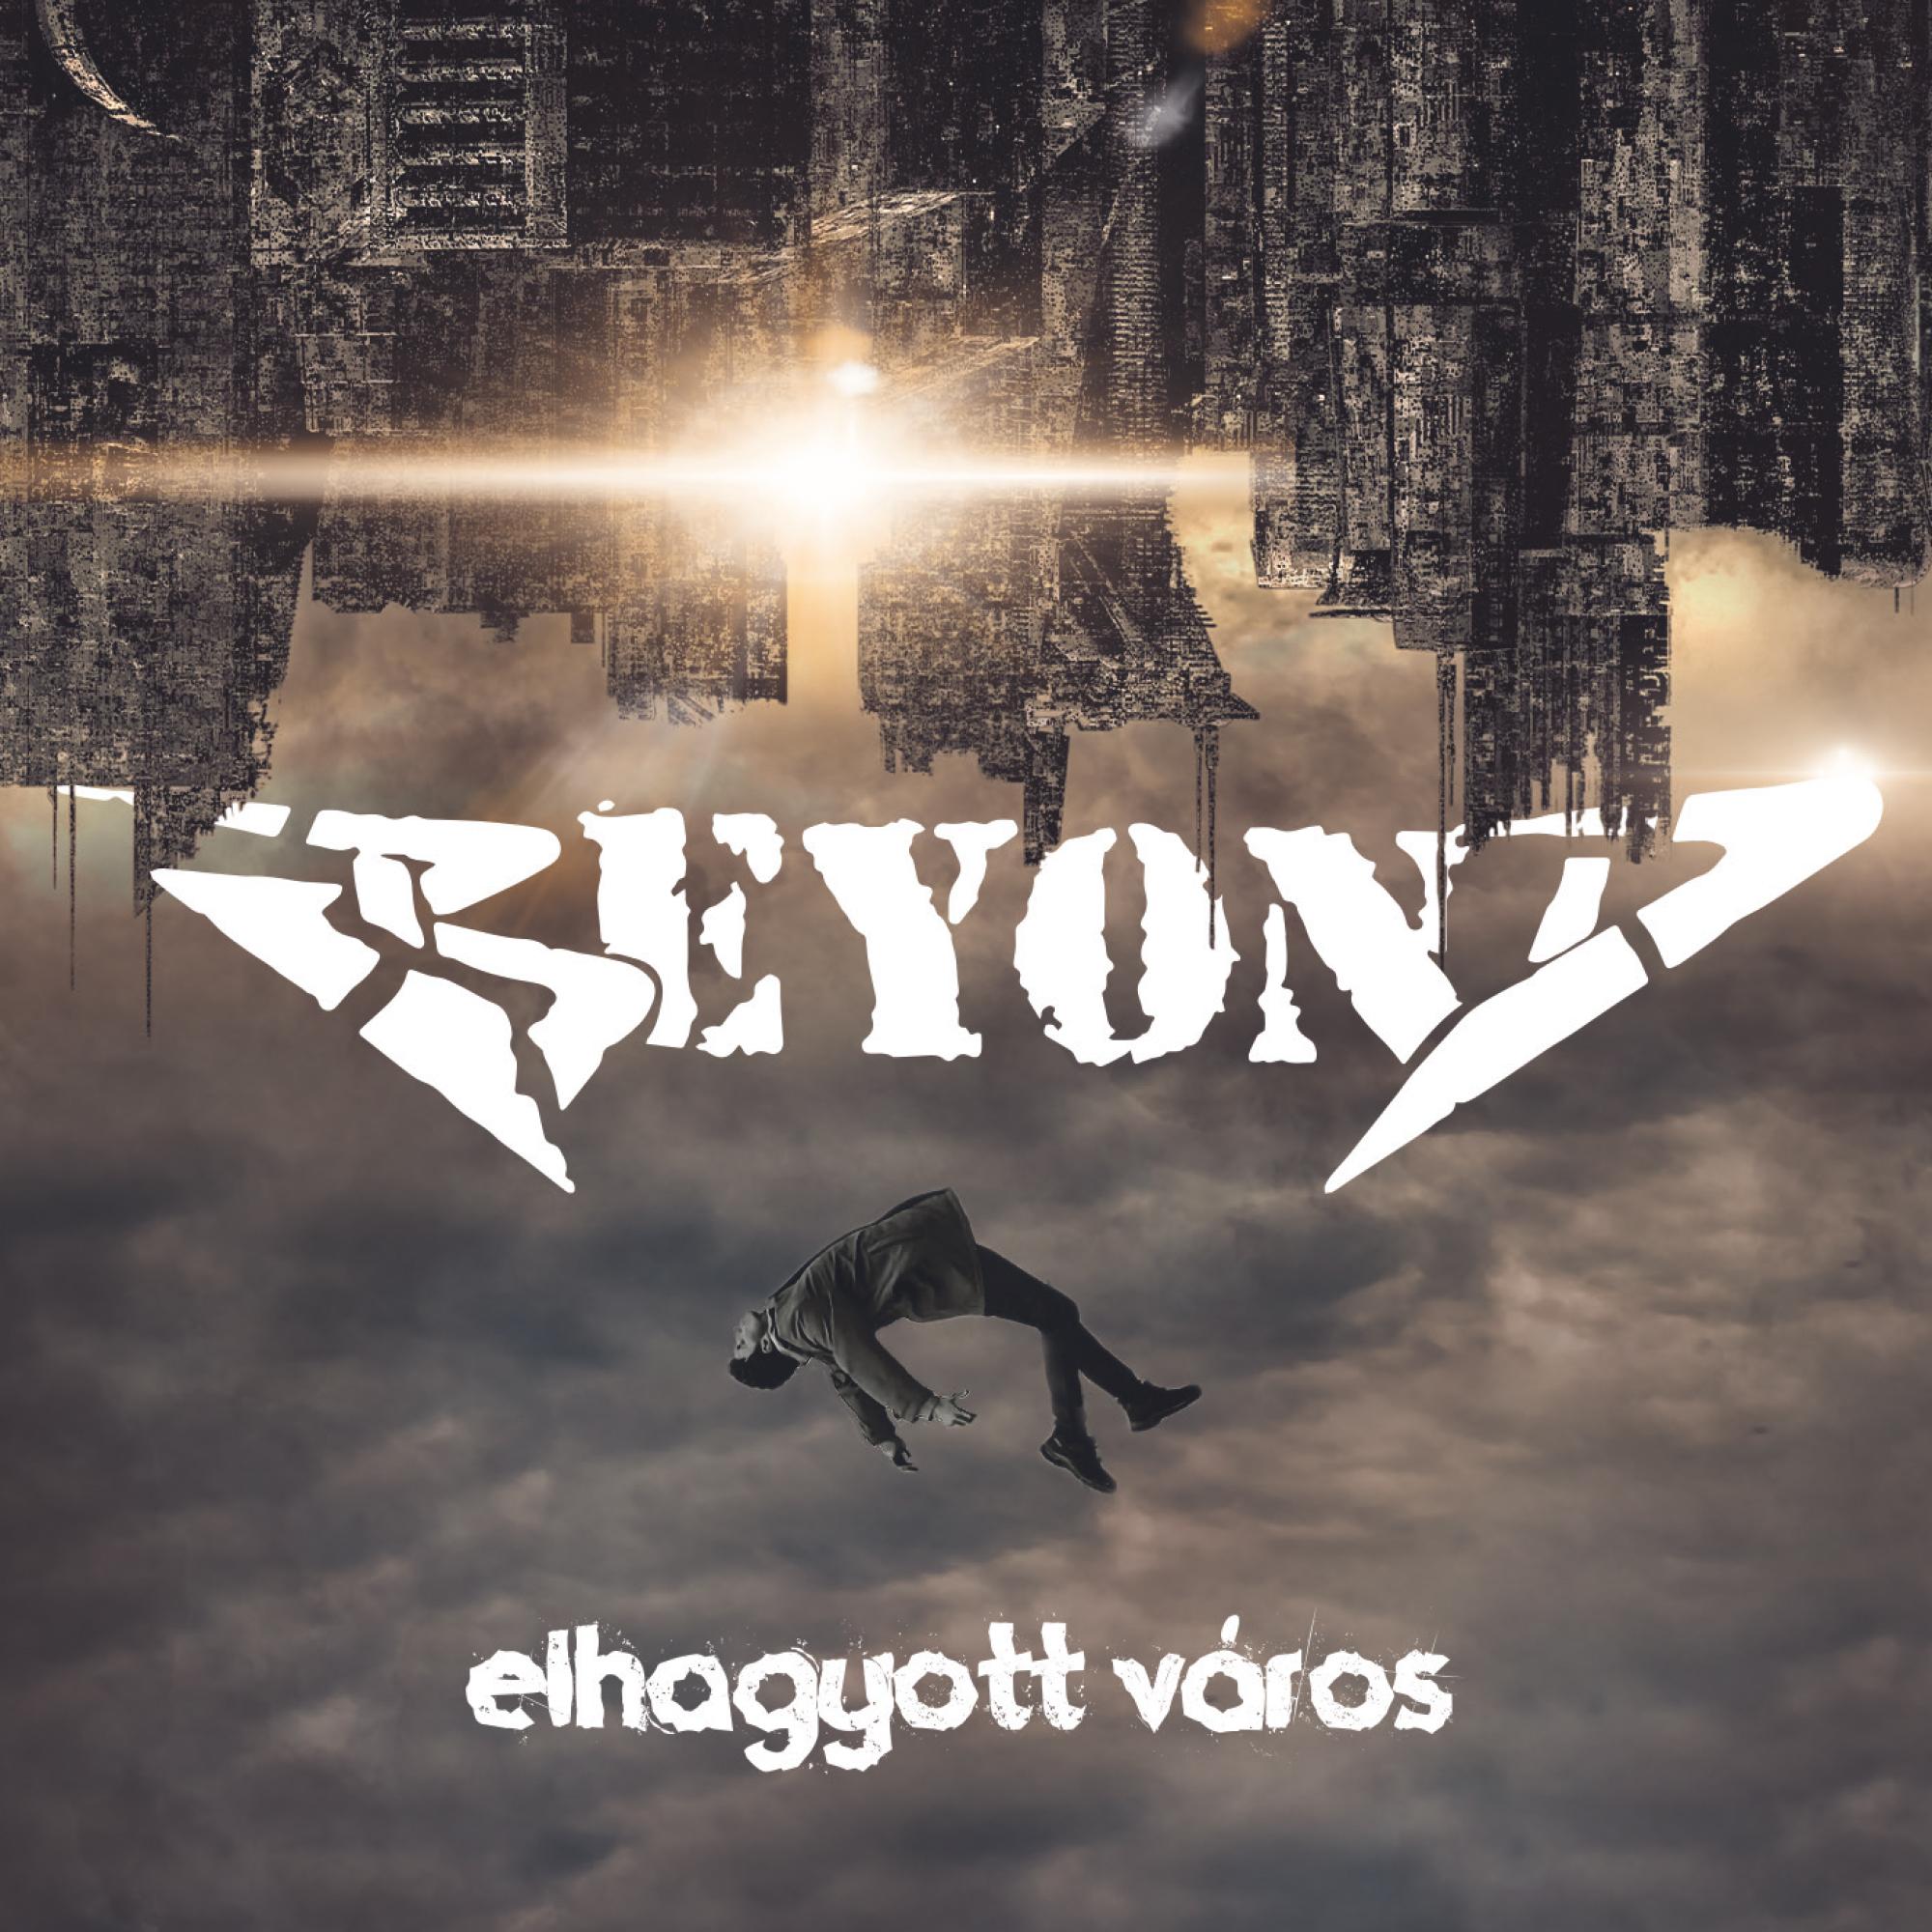 beyond_elhagyott_varos_cover_2000.jpg